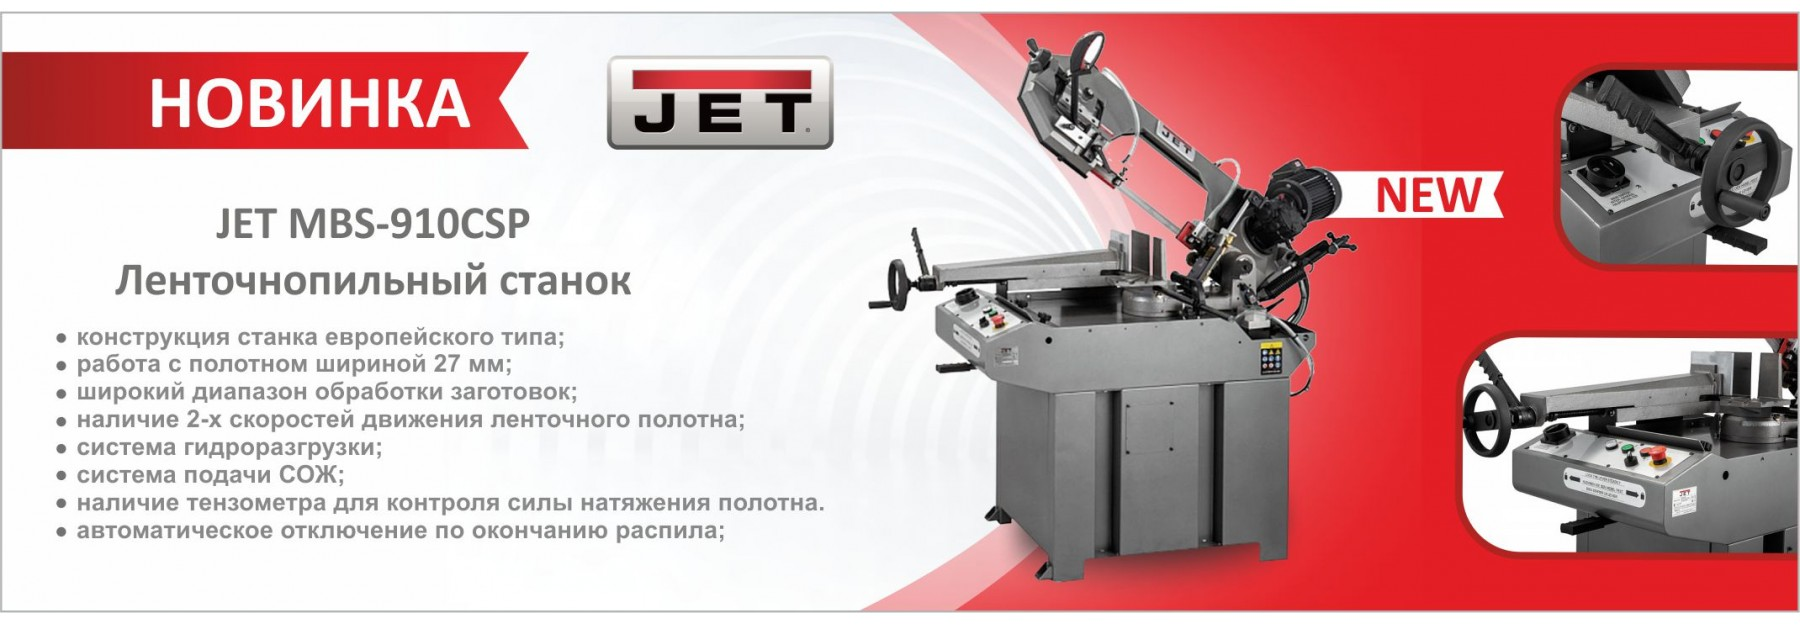 JET MBS-910CSP